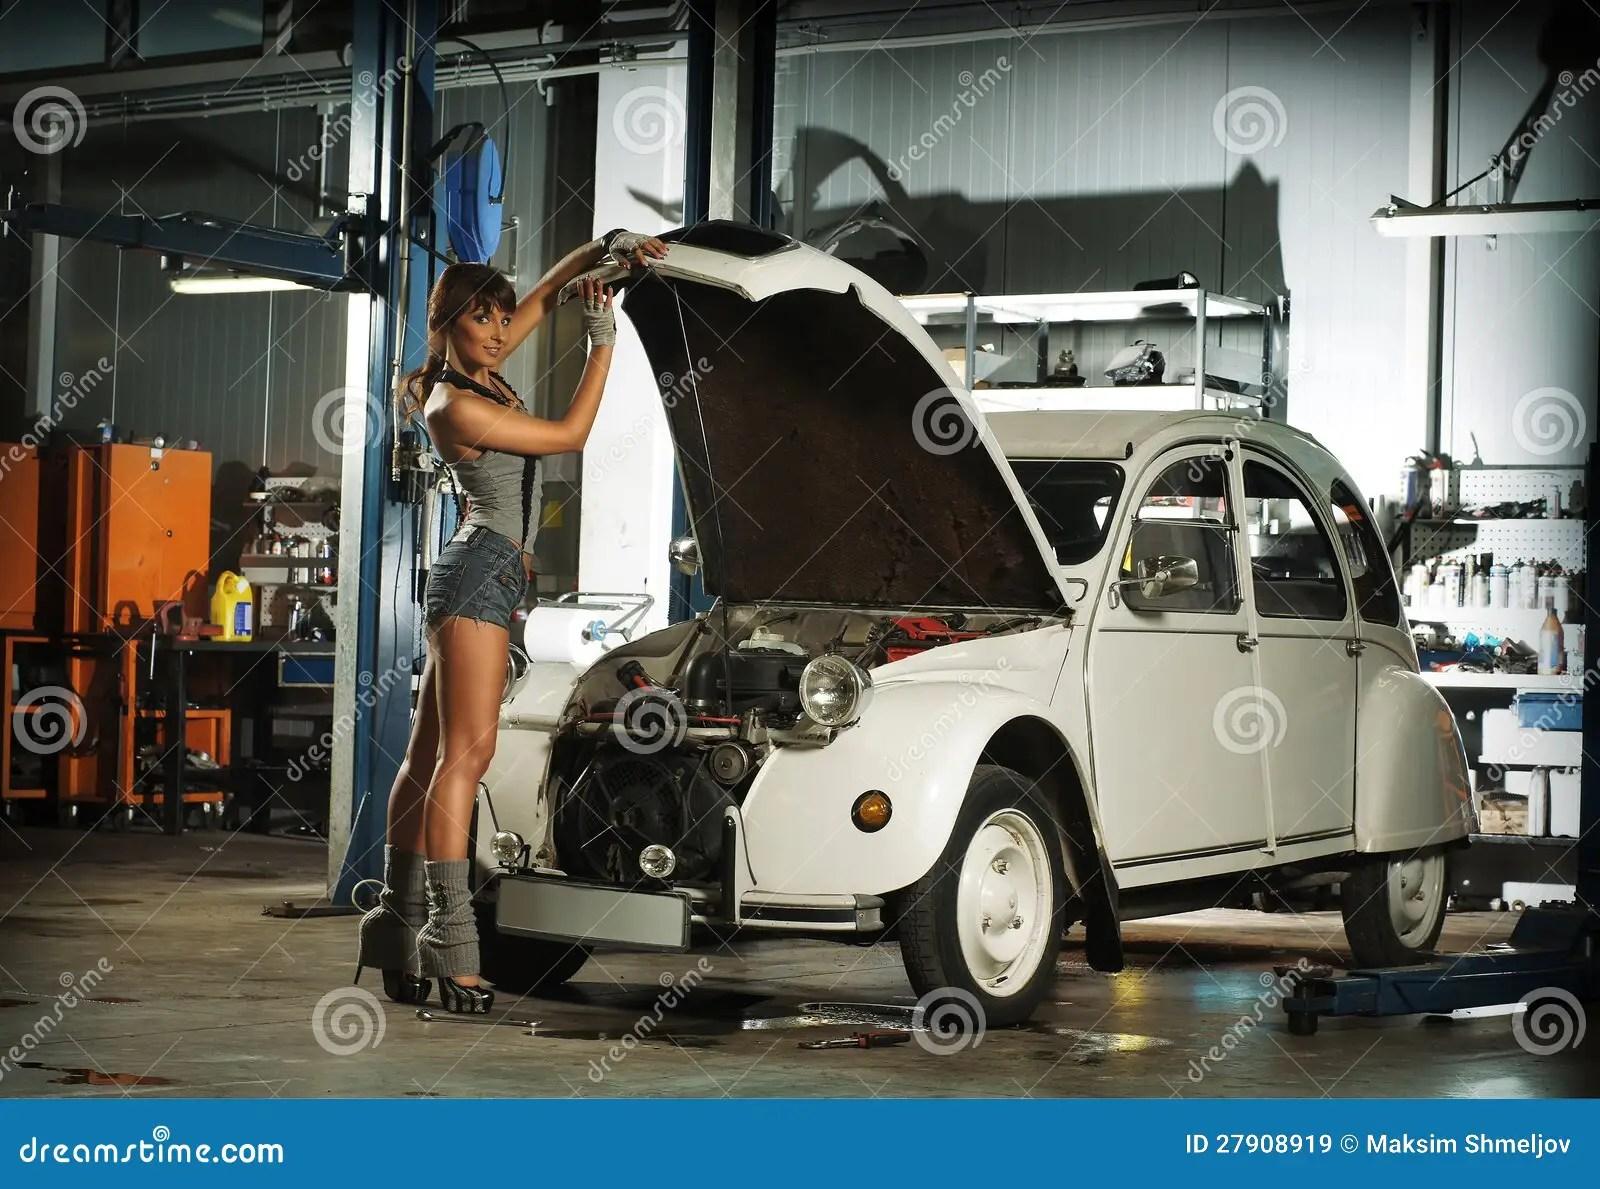 Free Wallpaper Cars And Beautiful Ladies Ferrari A Young Woman Repairing A Retro Car In A Garage Stock